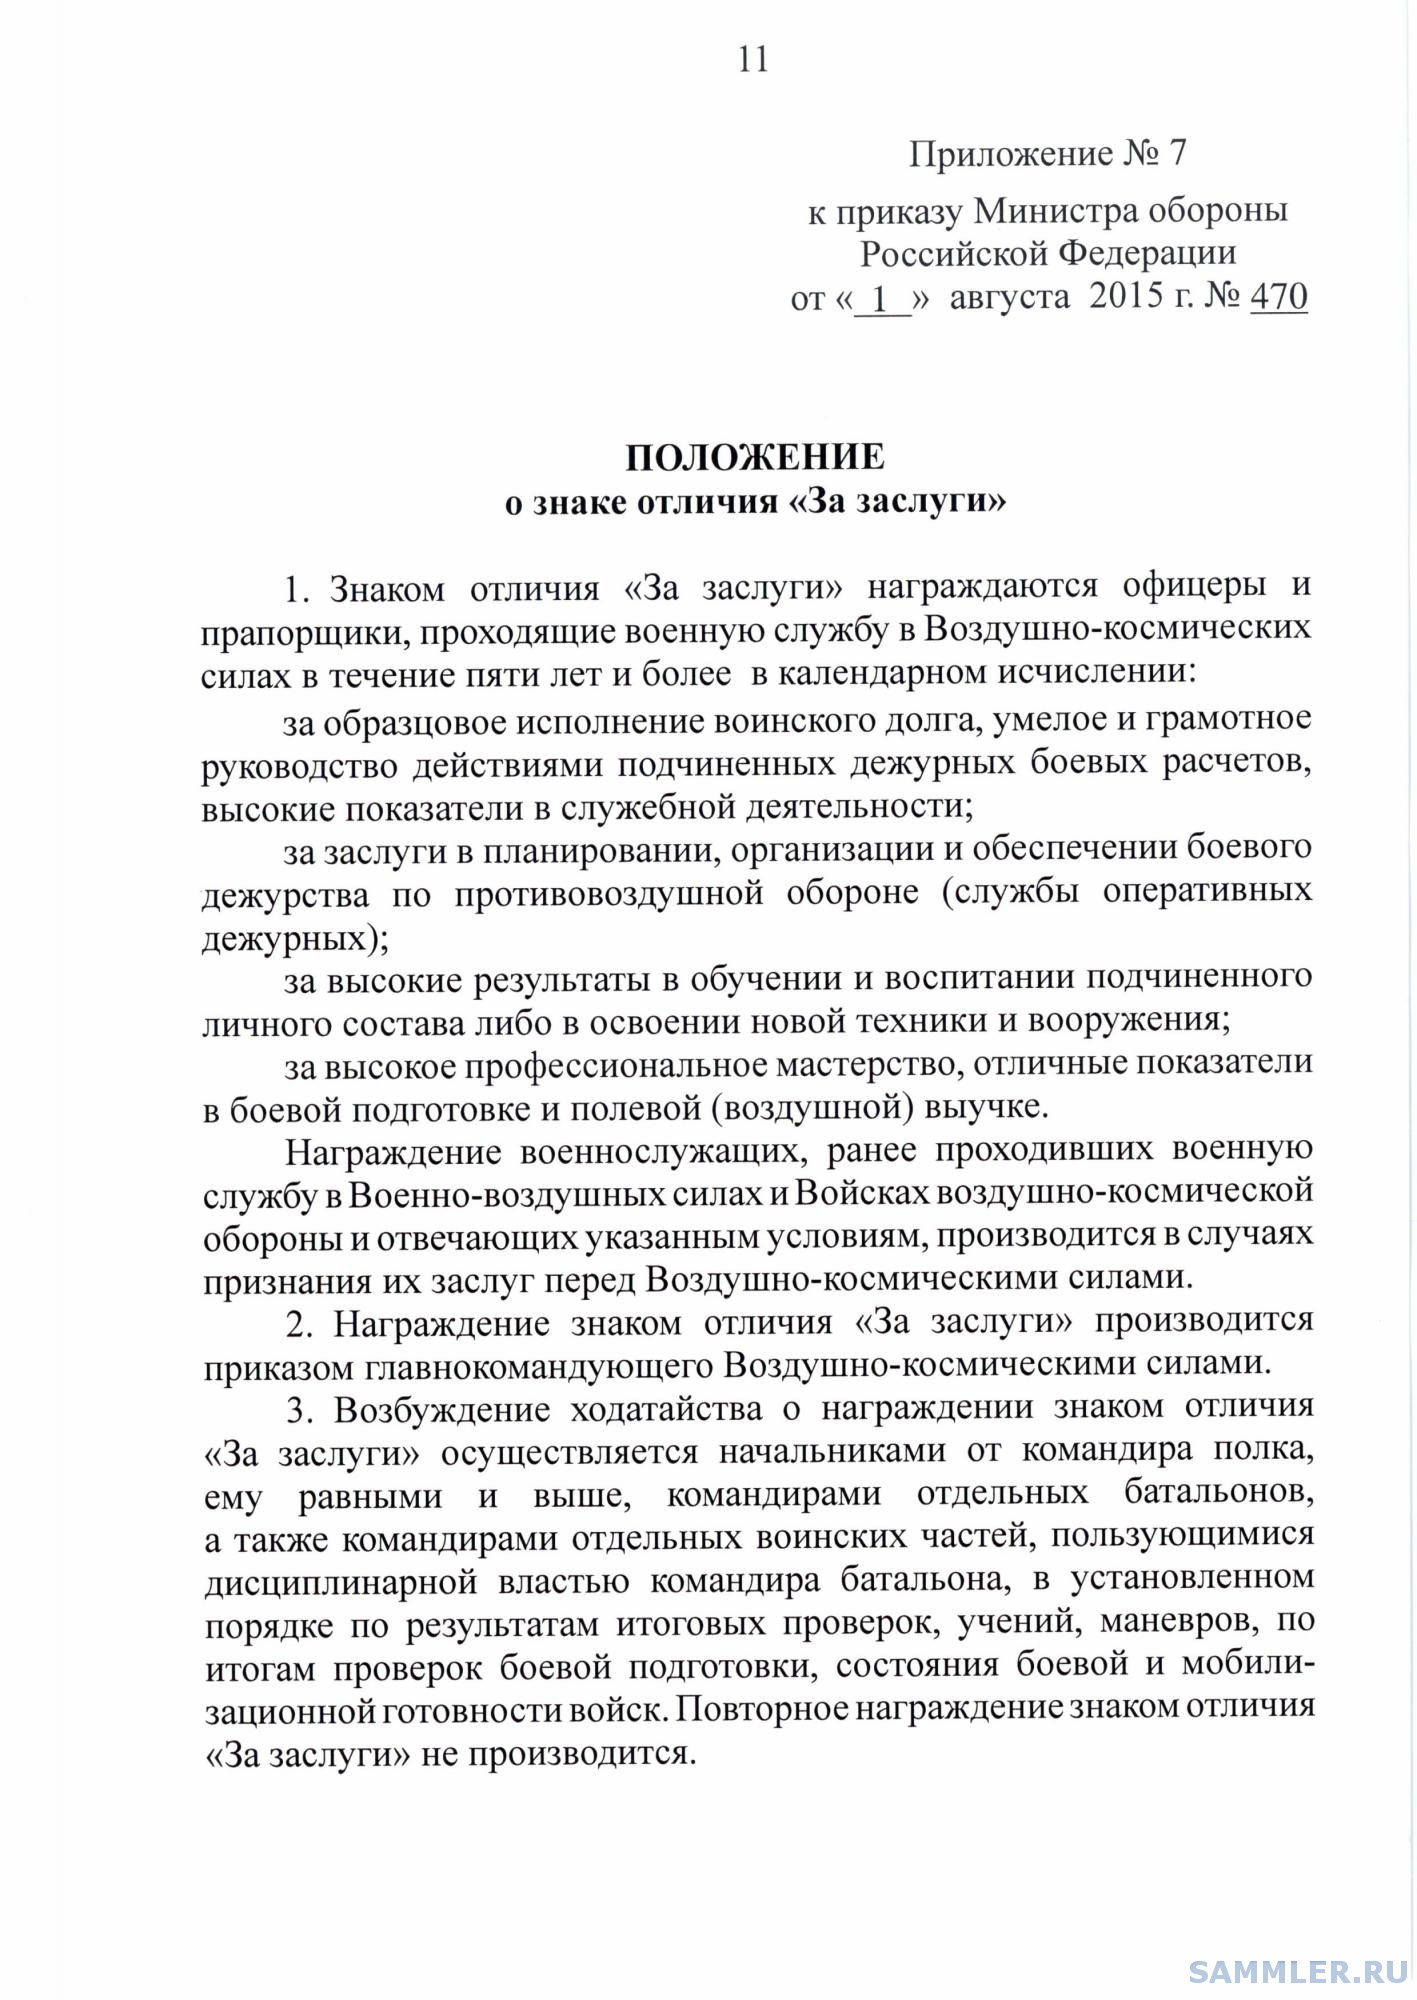 МО РФ 470(цвет)-11.jpg